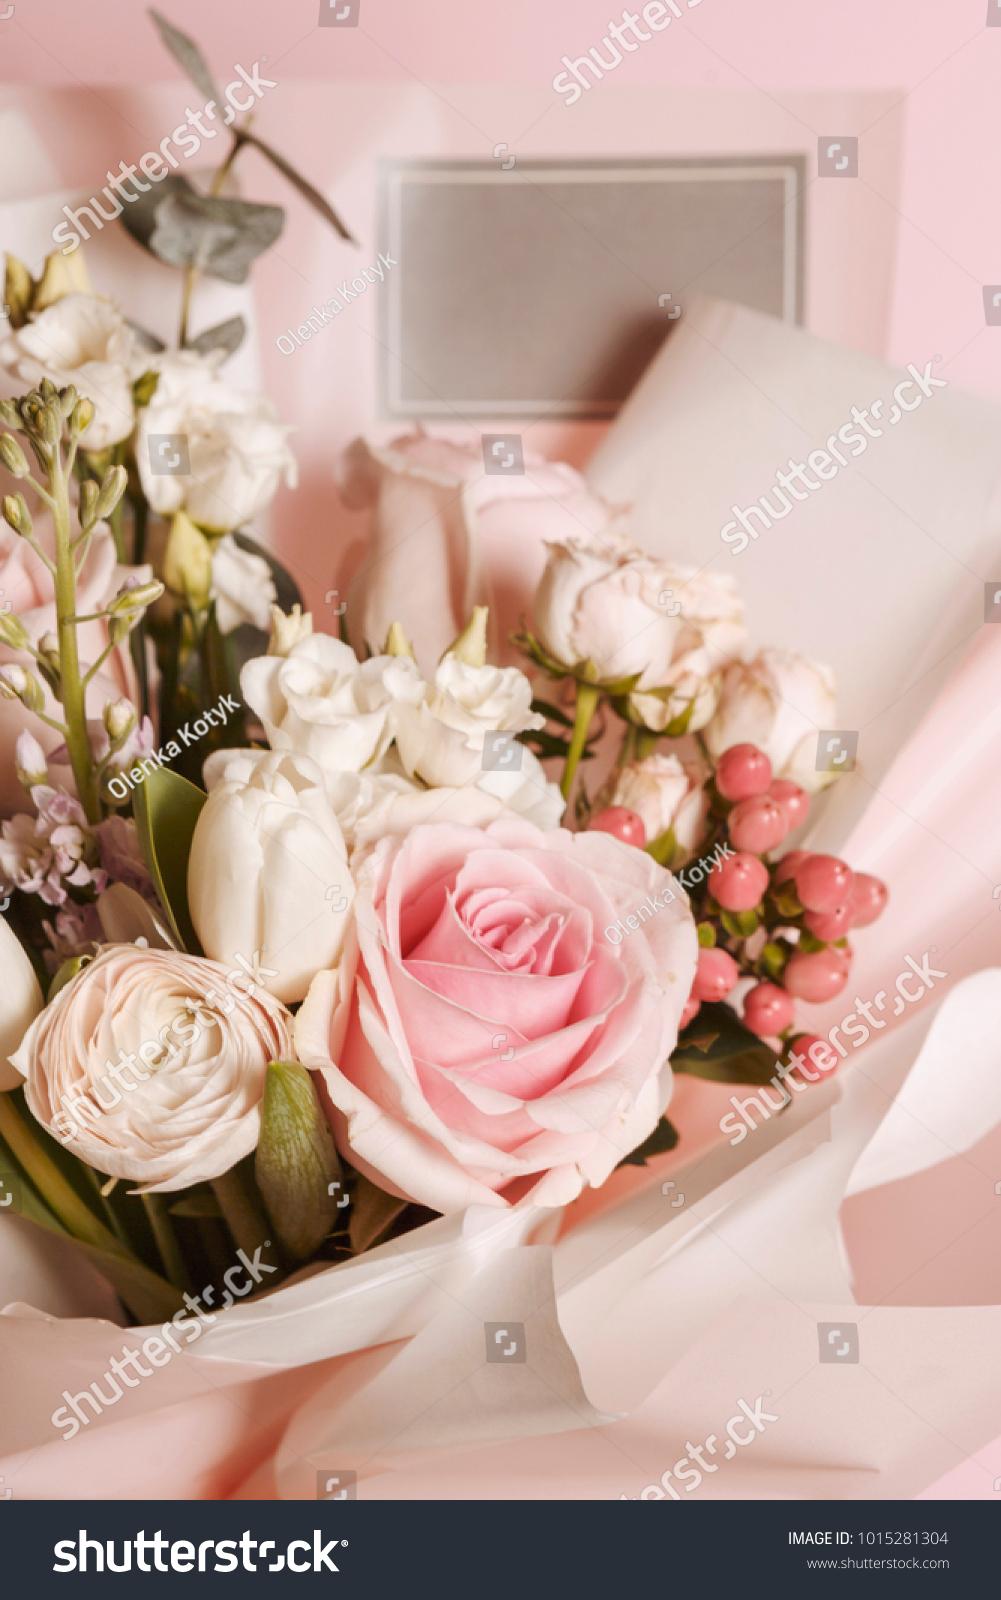 Peonies Ranunculus Flower Bouquet Gift Card Stock Photo Edit Now 1015281304